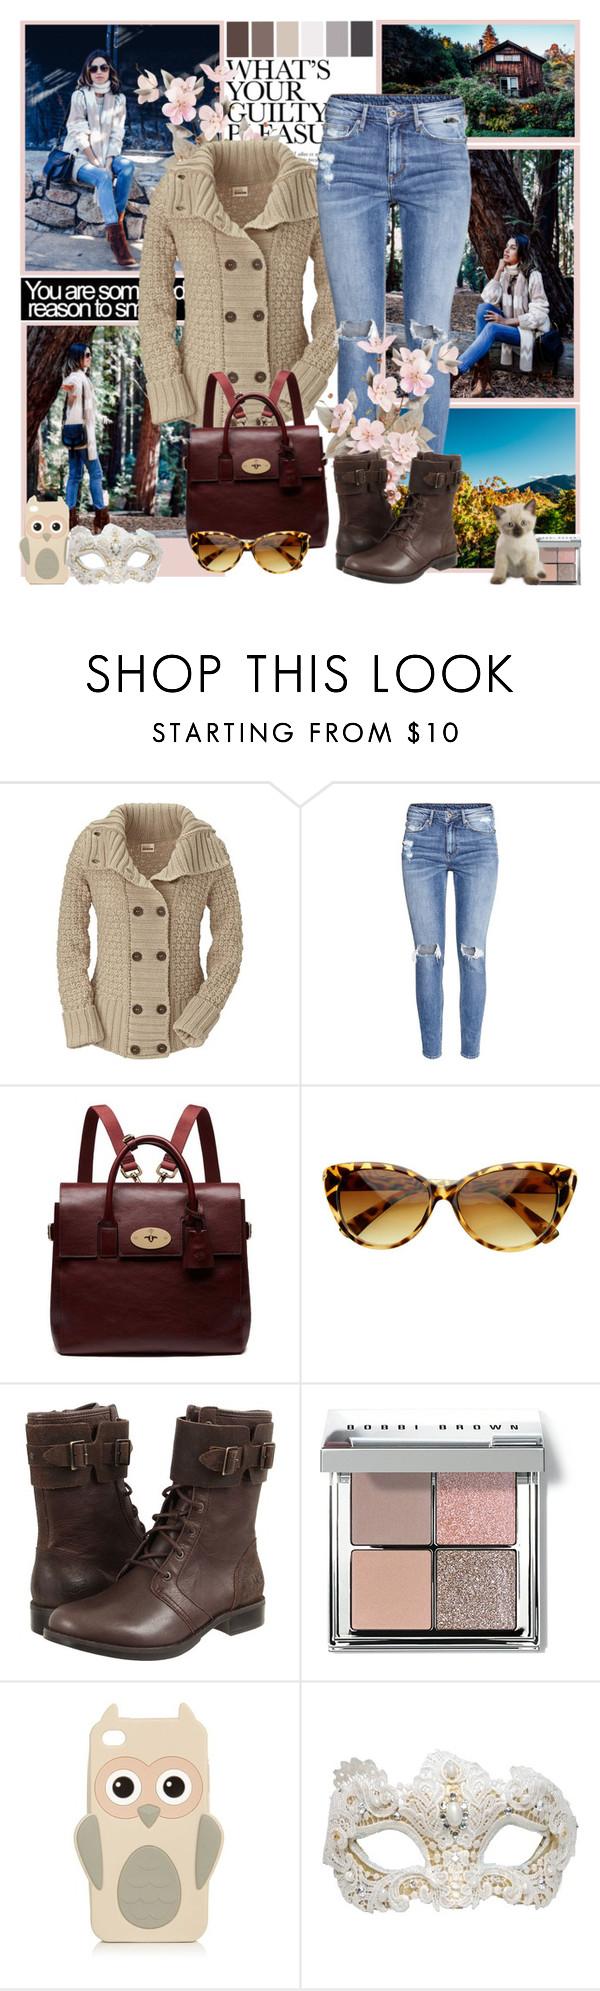 """..."" by milica-b3 ❤ liked on Polyvore featuring Kafé Stigur, H&M, Mulberry, Retrò, UGG Australia, Seed Design, Bobbi Brown Cosmetics, Swarovski, women's clothing and women"